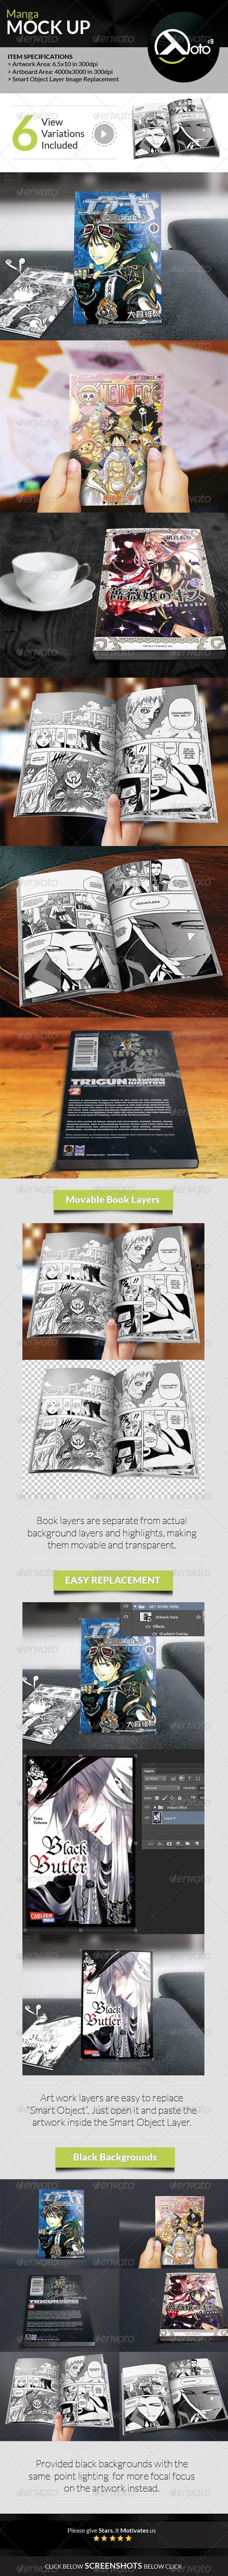 GraphicRiver Manga Japanese Comics Mock up 8423940